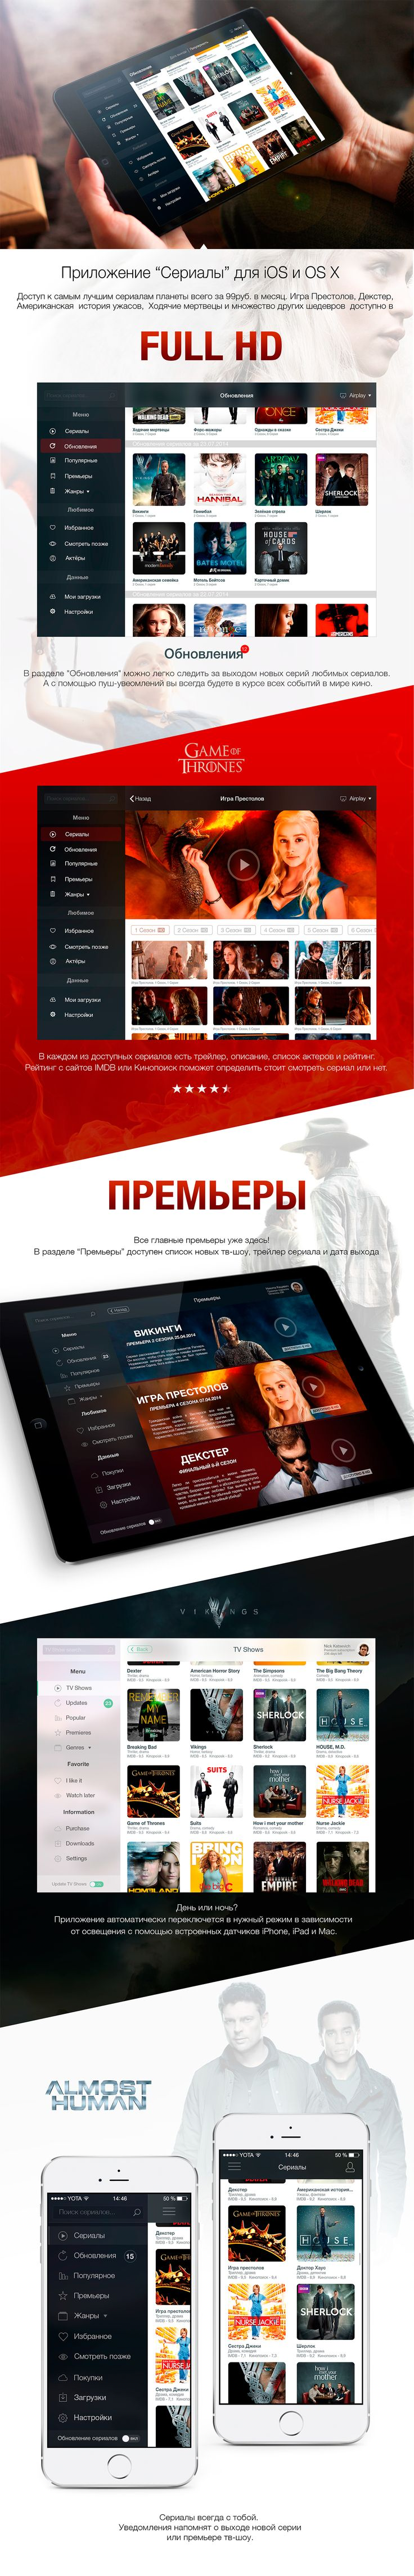 "App for iPad ""Serials"" / Приложение для iPad ""Сериалы"" on Behance"